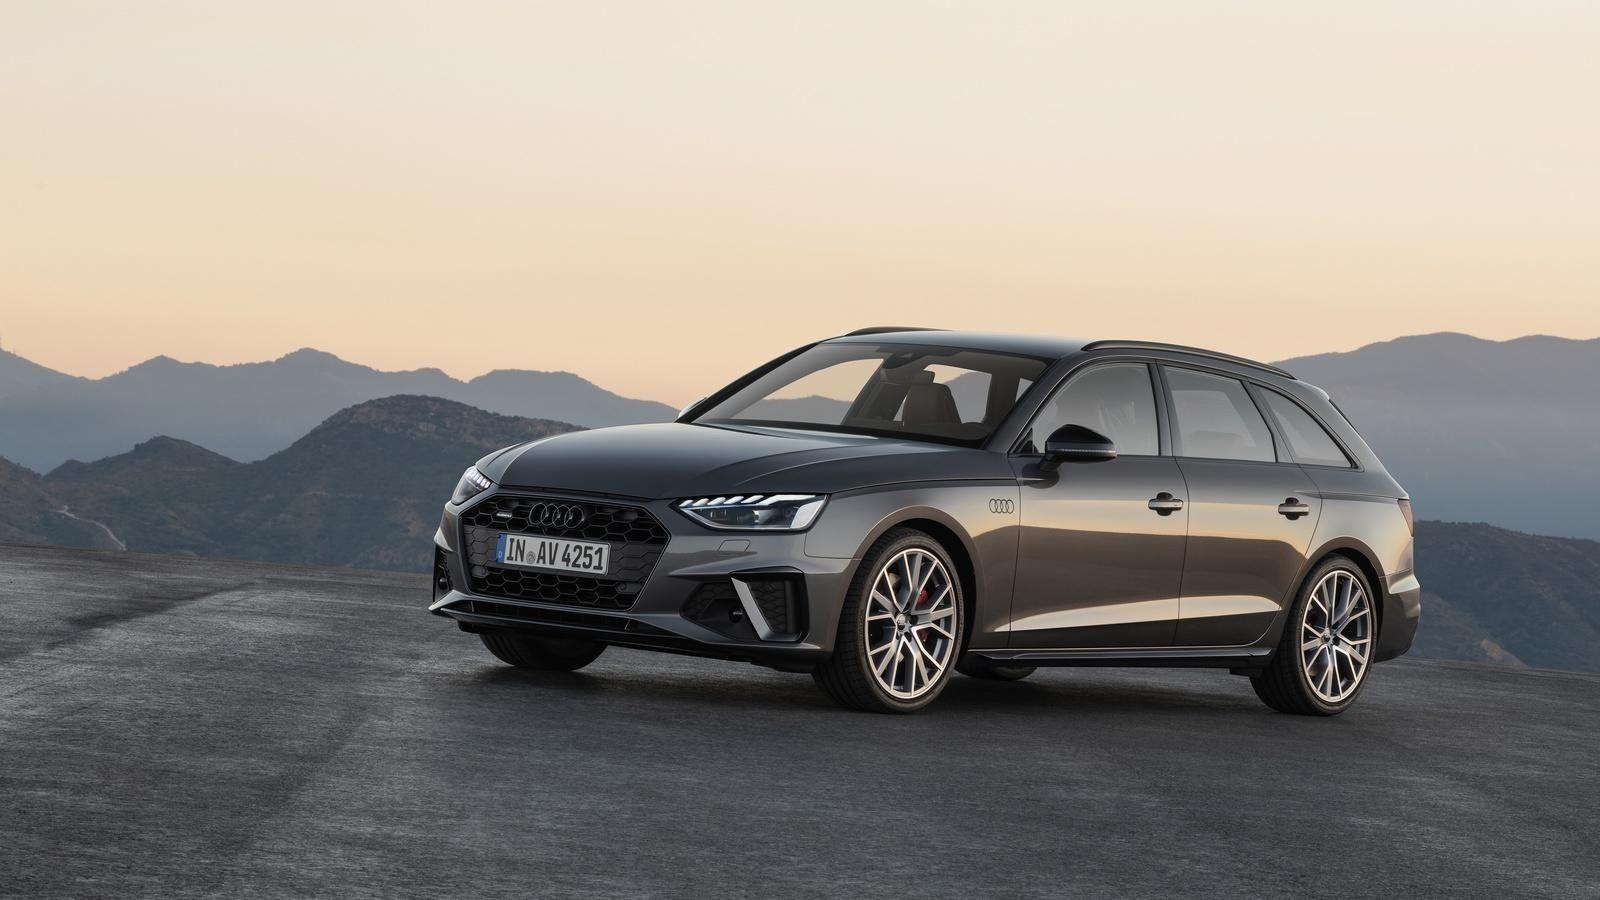 2020 Audi A4 Avant Specs Audi A4 Avant Audi A4 Audi Wagon